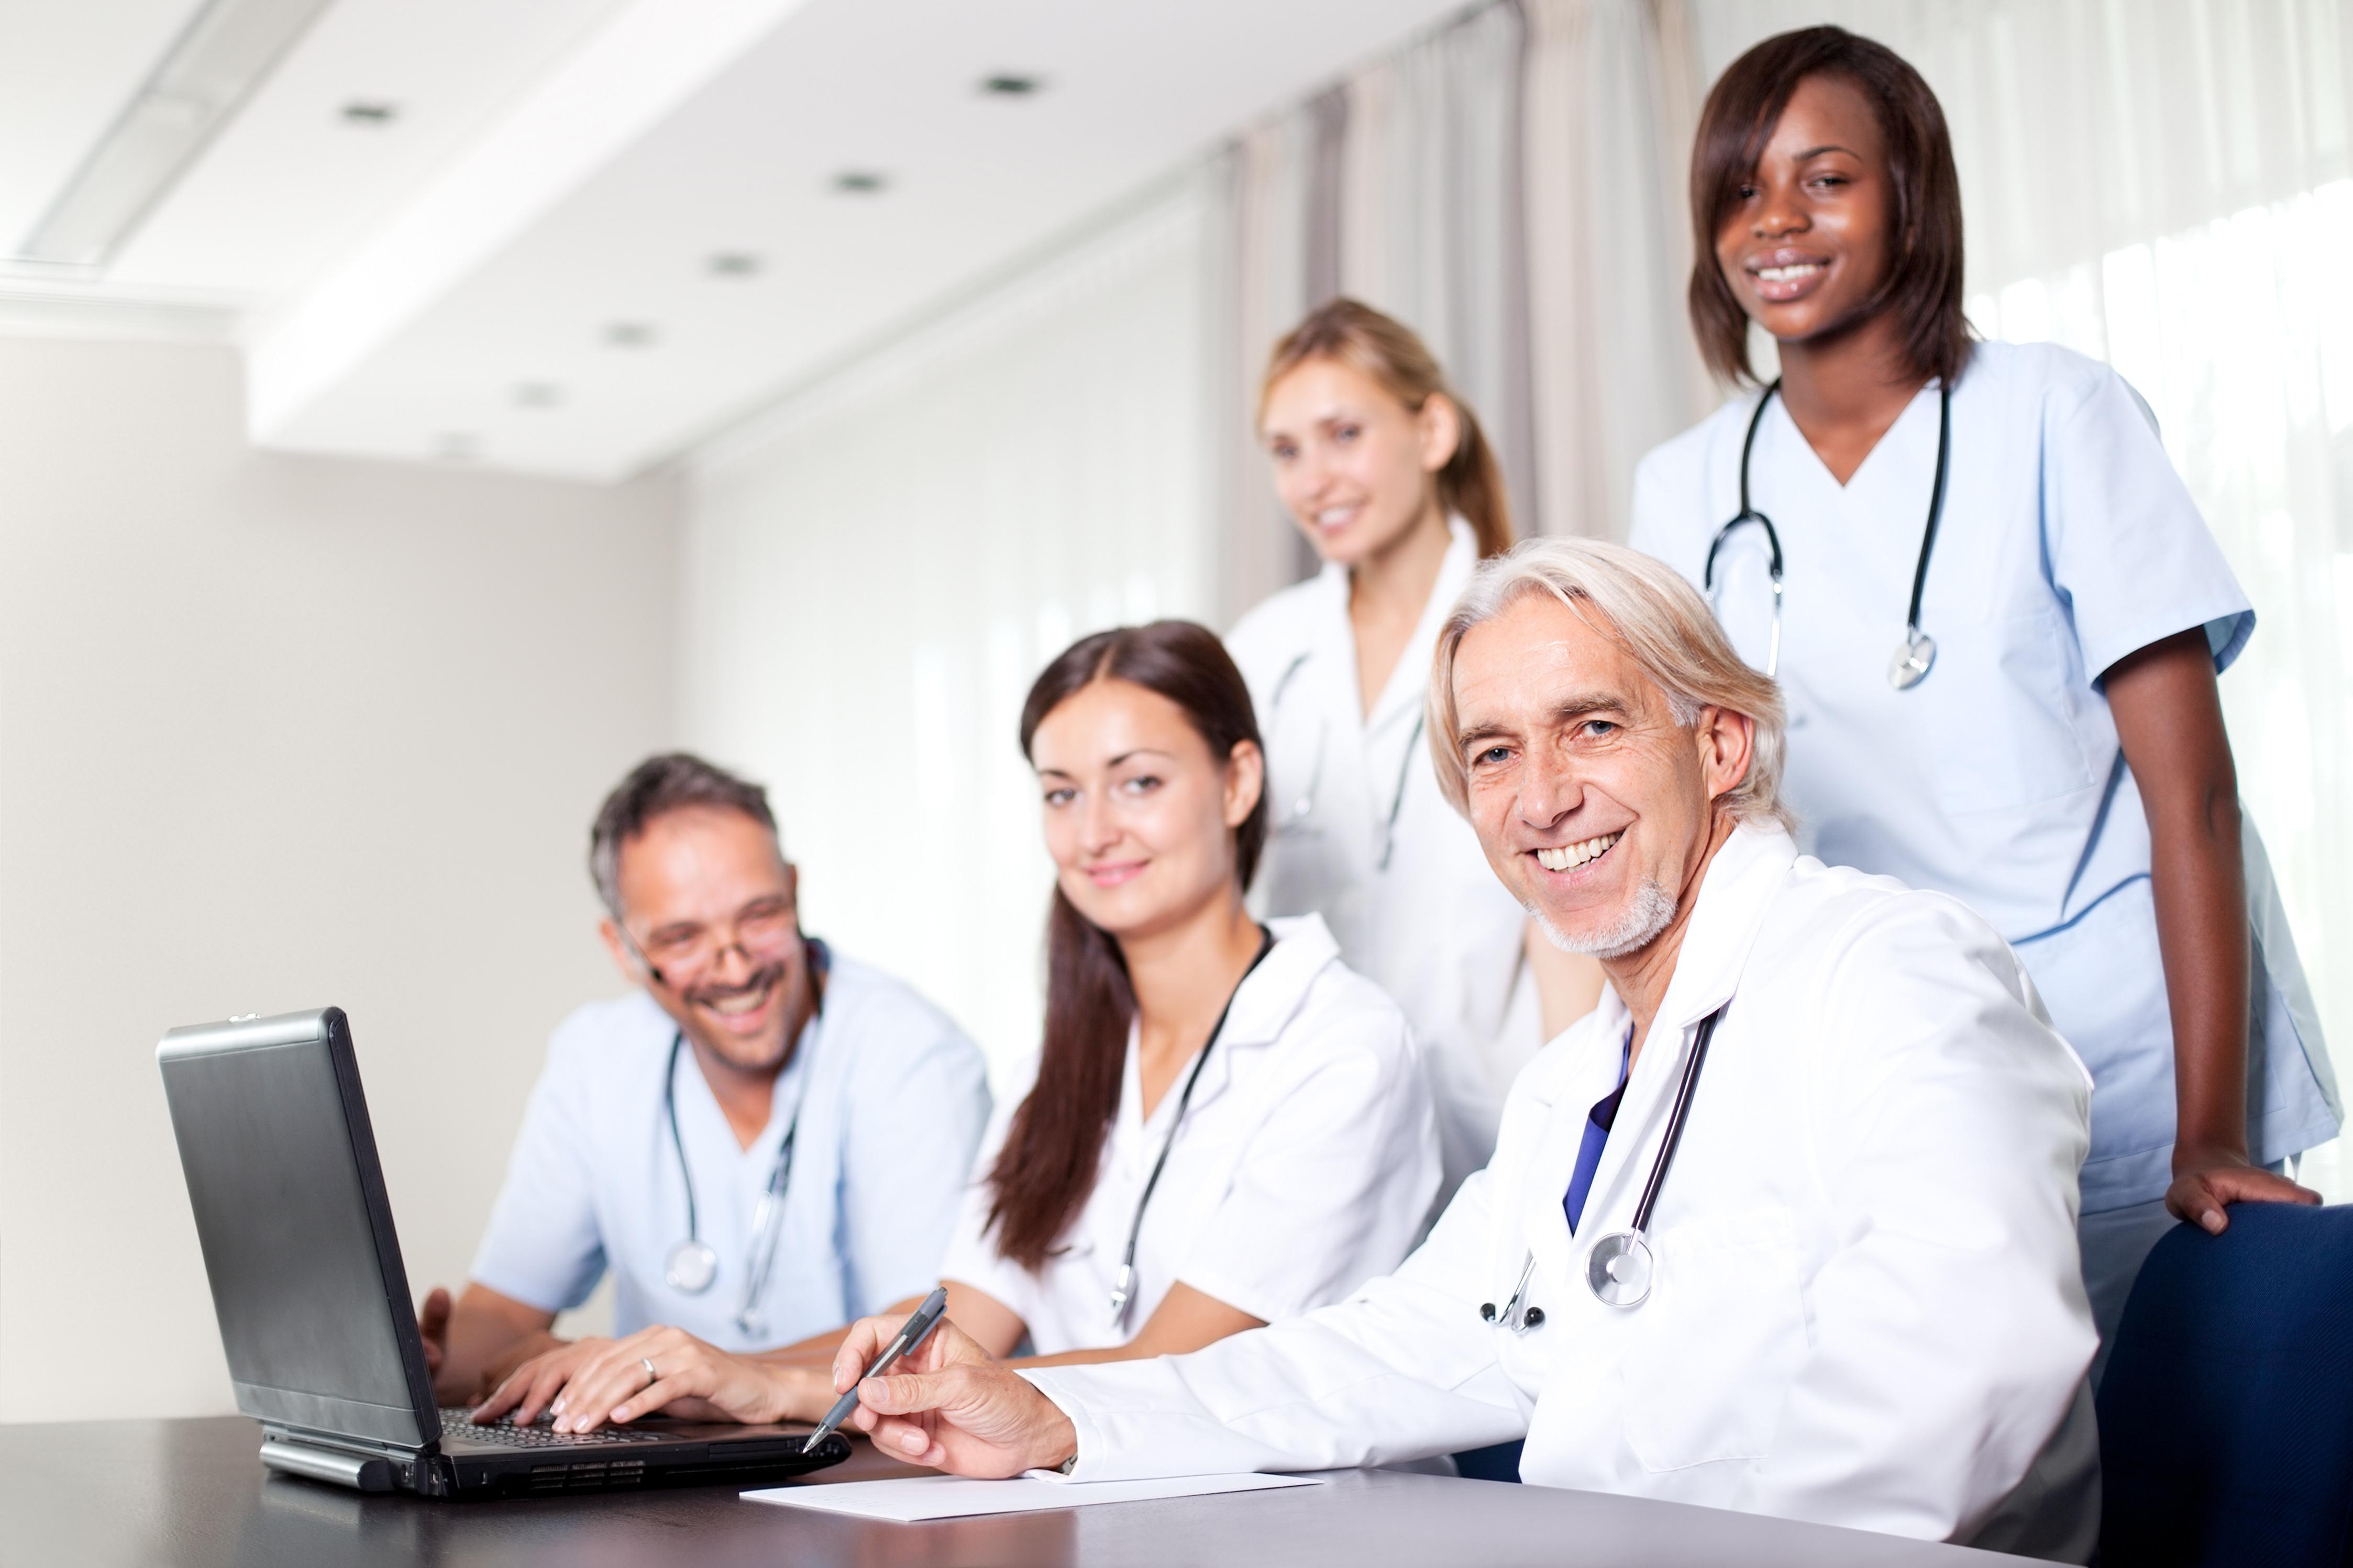 Dental / Medical Team Wellness